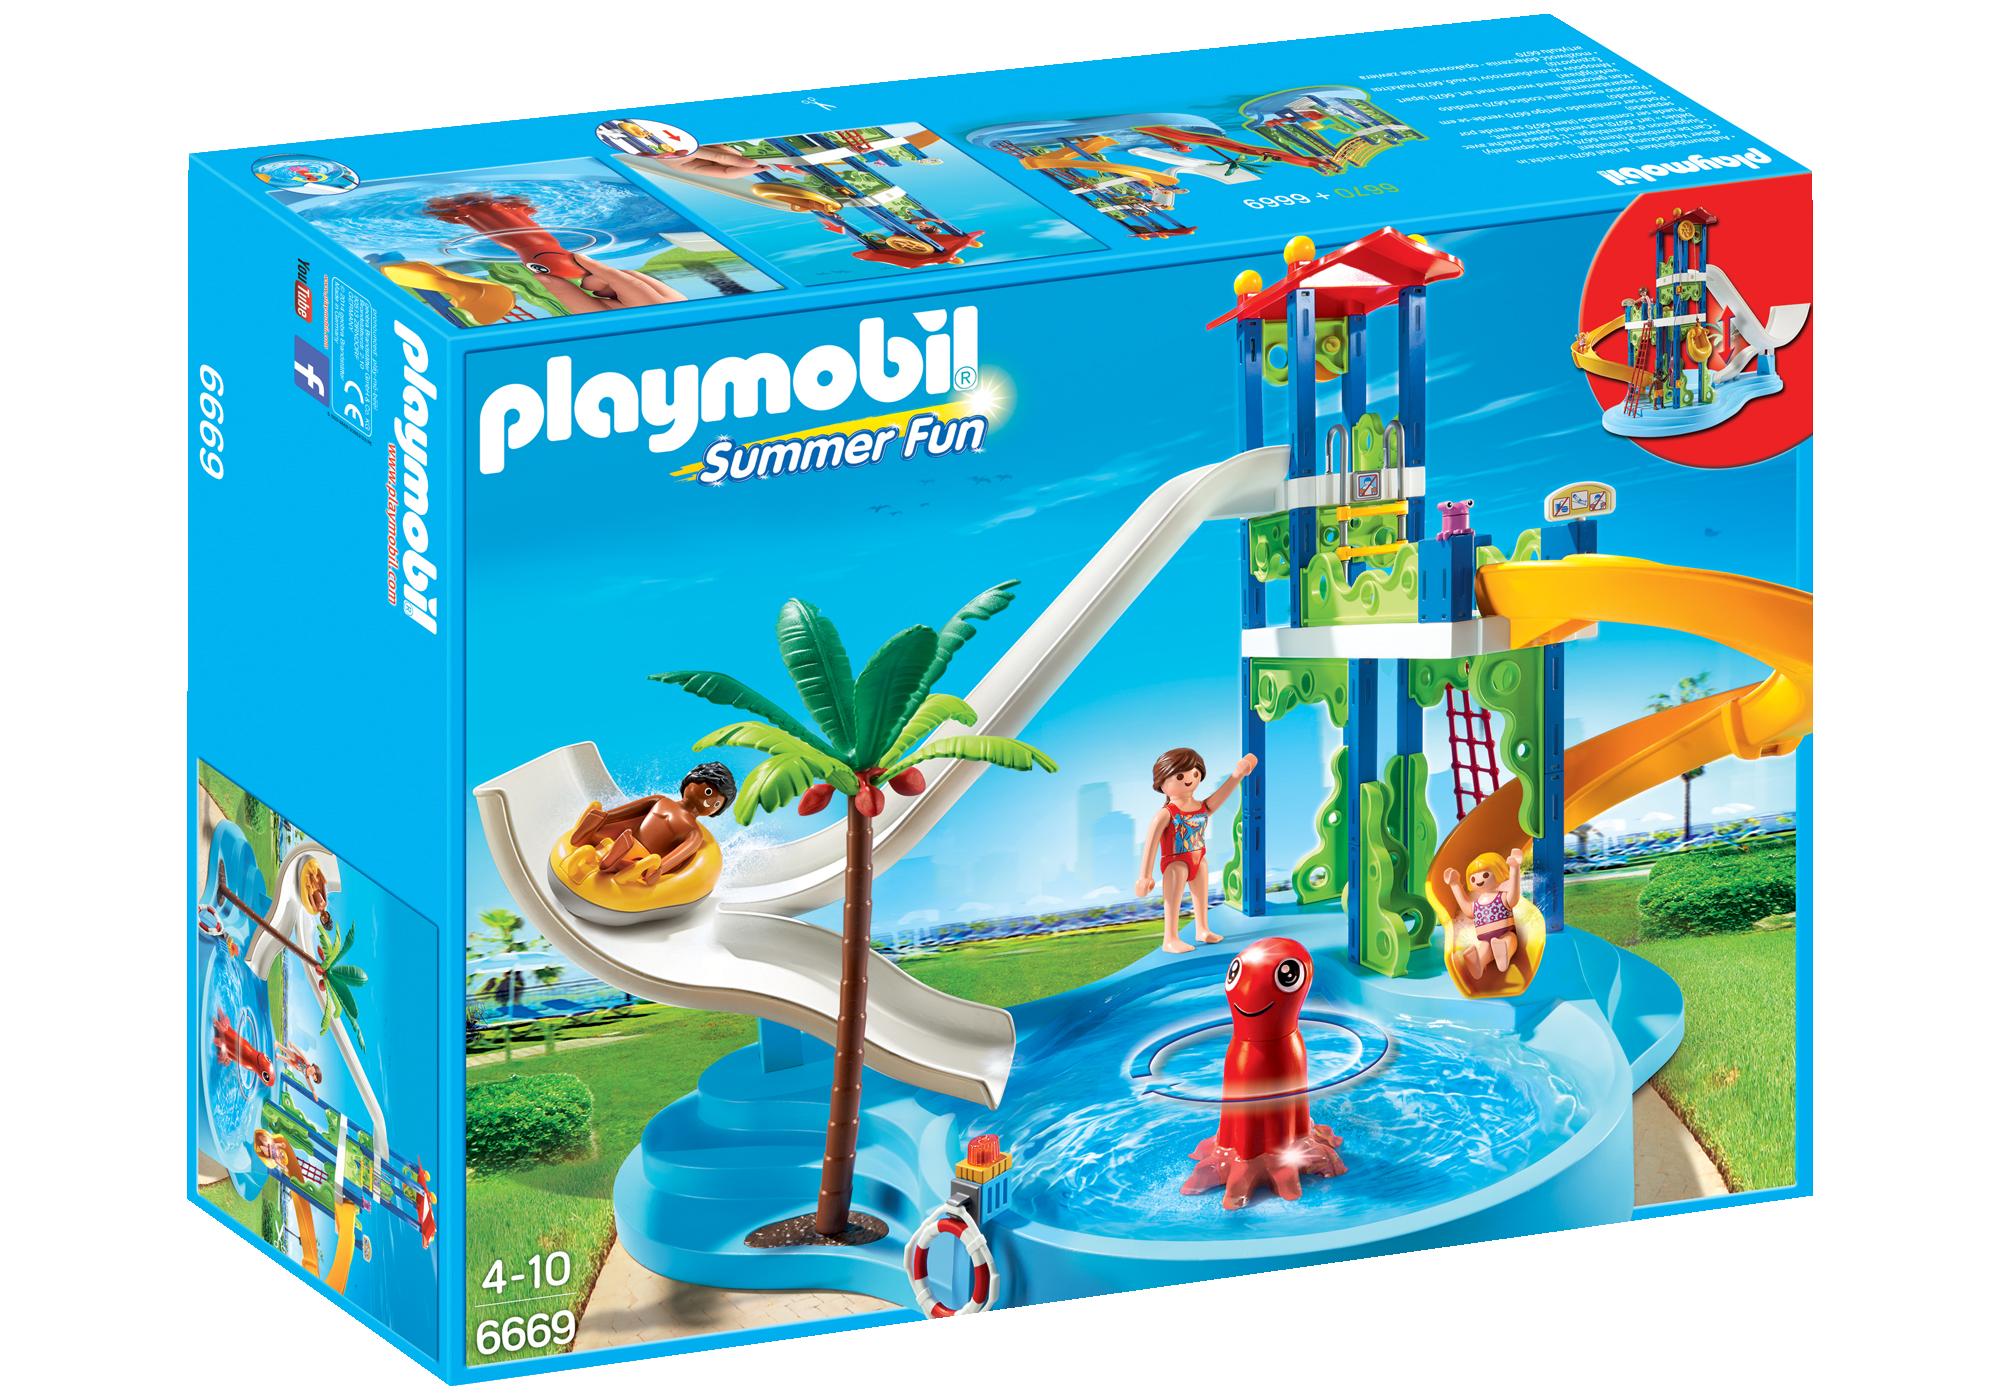 http://media.playmobil.com/i/playmobil/6669_product_box_front/Torre degli scivoli con piscina